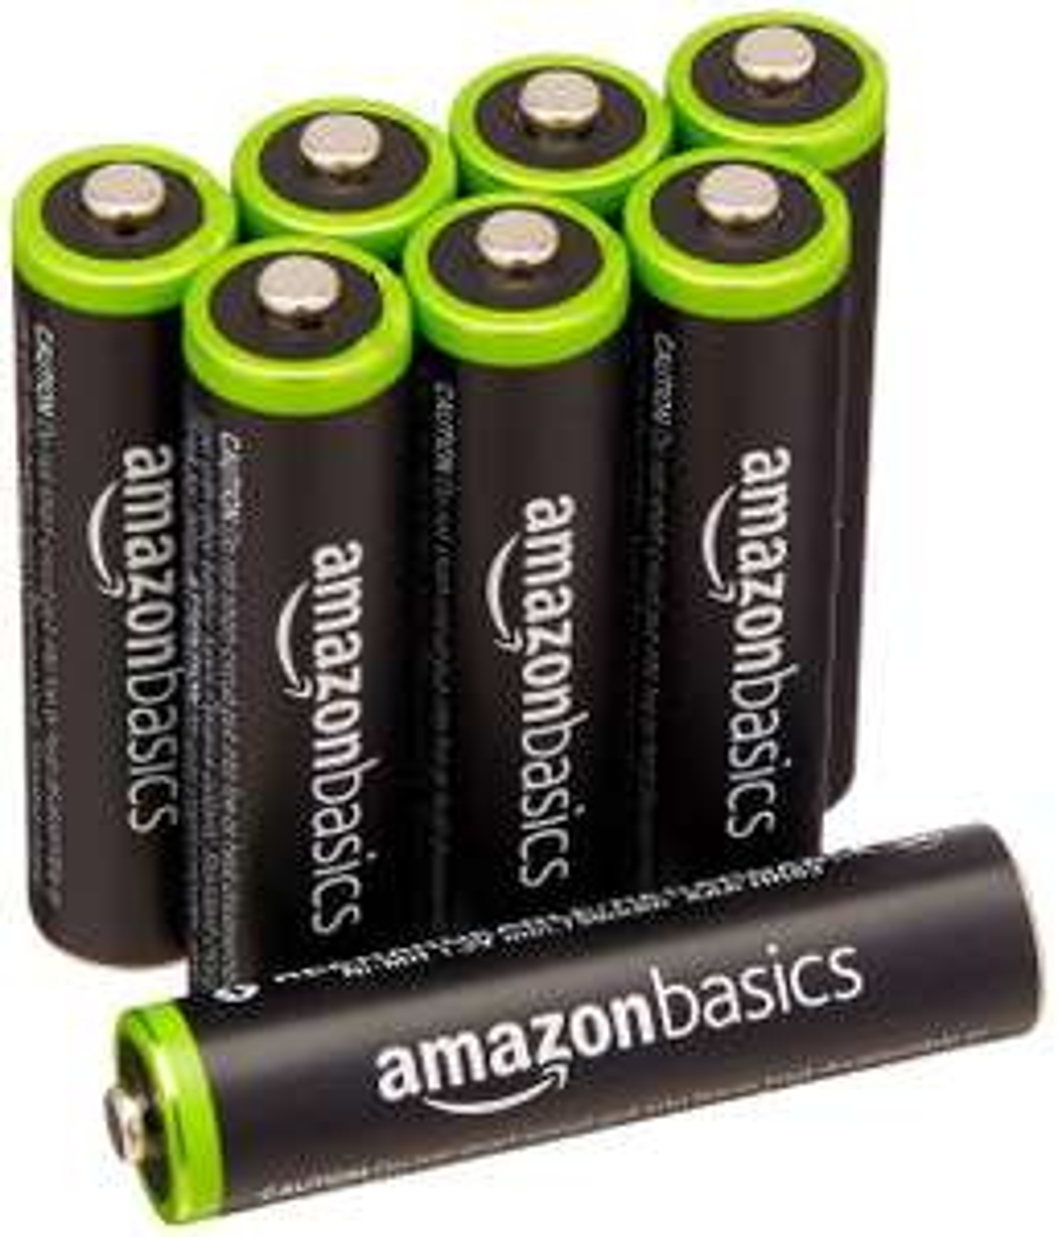 Lot de 8 piles rechargeables Ni-MH AmazonBasics  Type AAA 1000 cycles 800 mAh 1,2 V